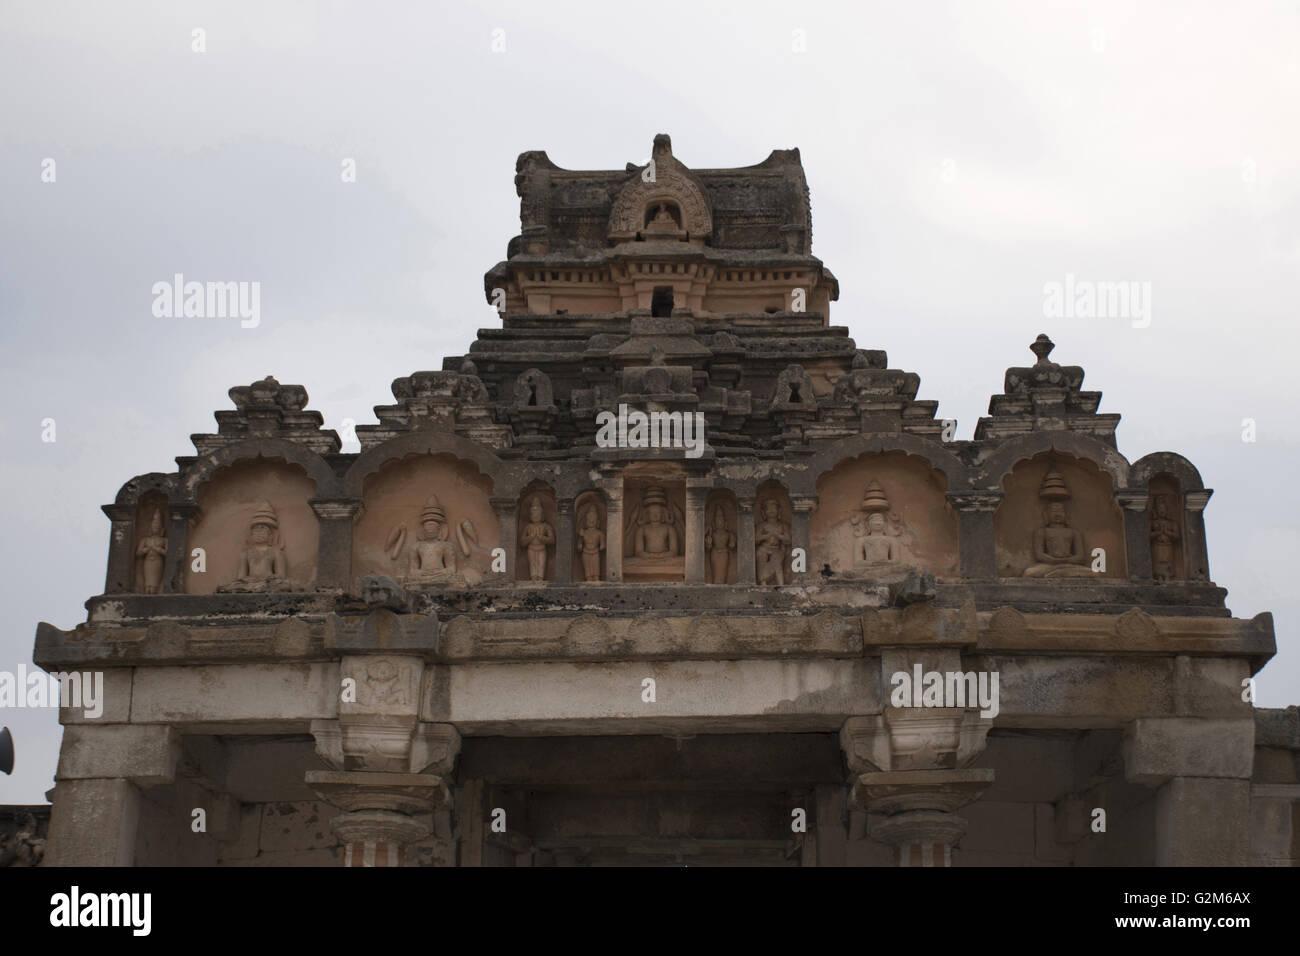 Carved figures at the top of the entrance, Gomateshwara temple, Vindhyagiri Hill, Shravanbelgola, Karnataka, India. Stock Photo